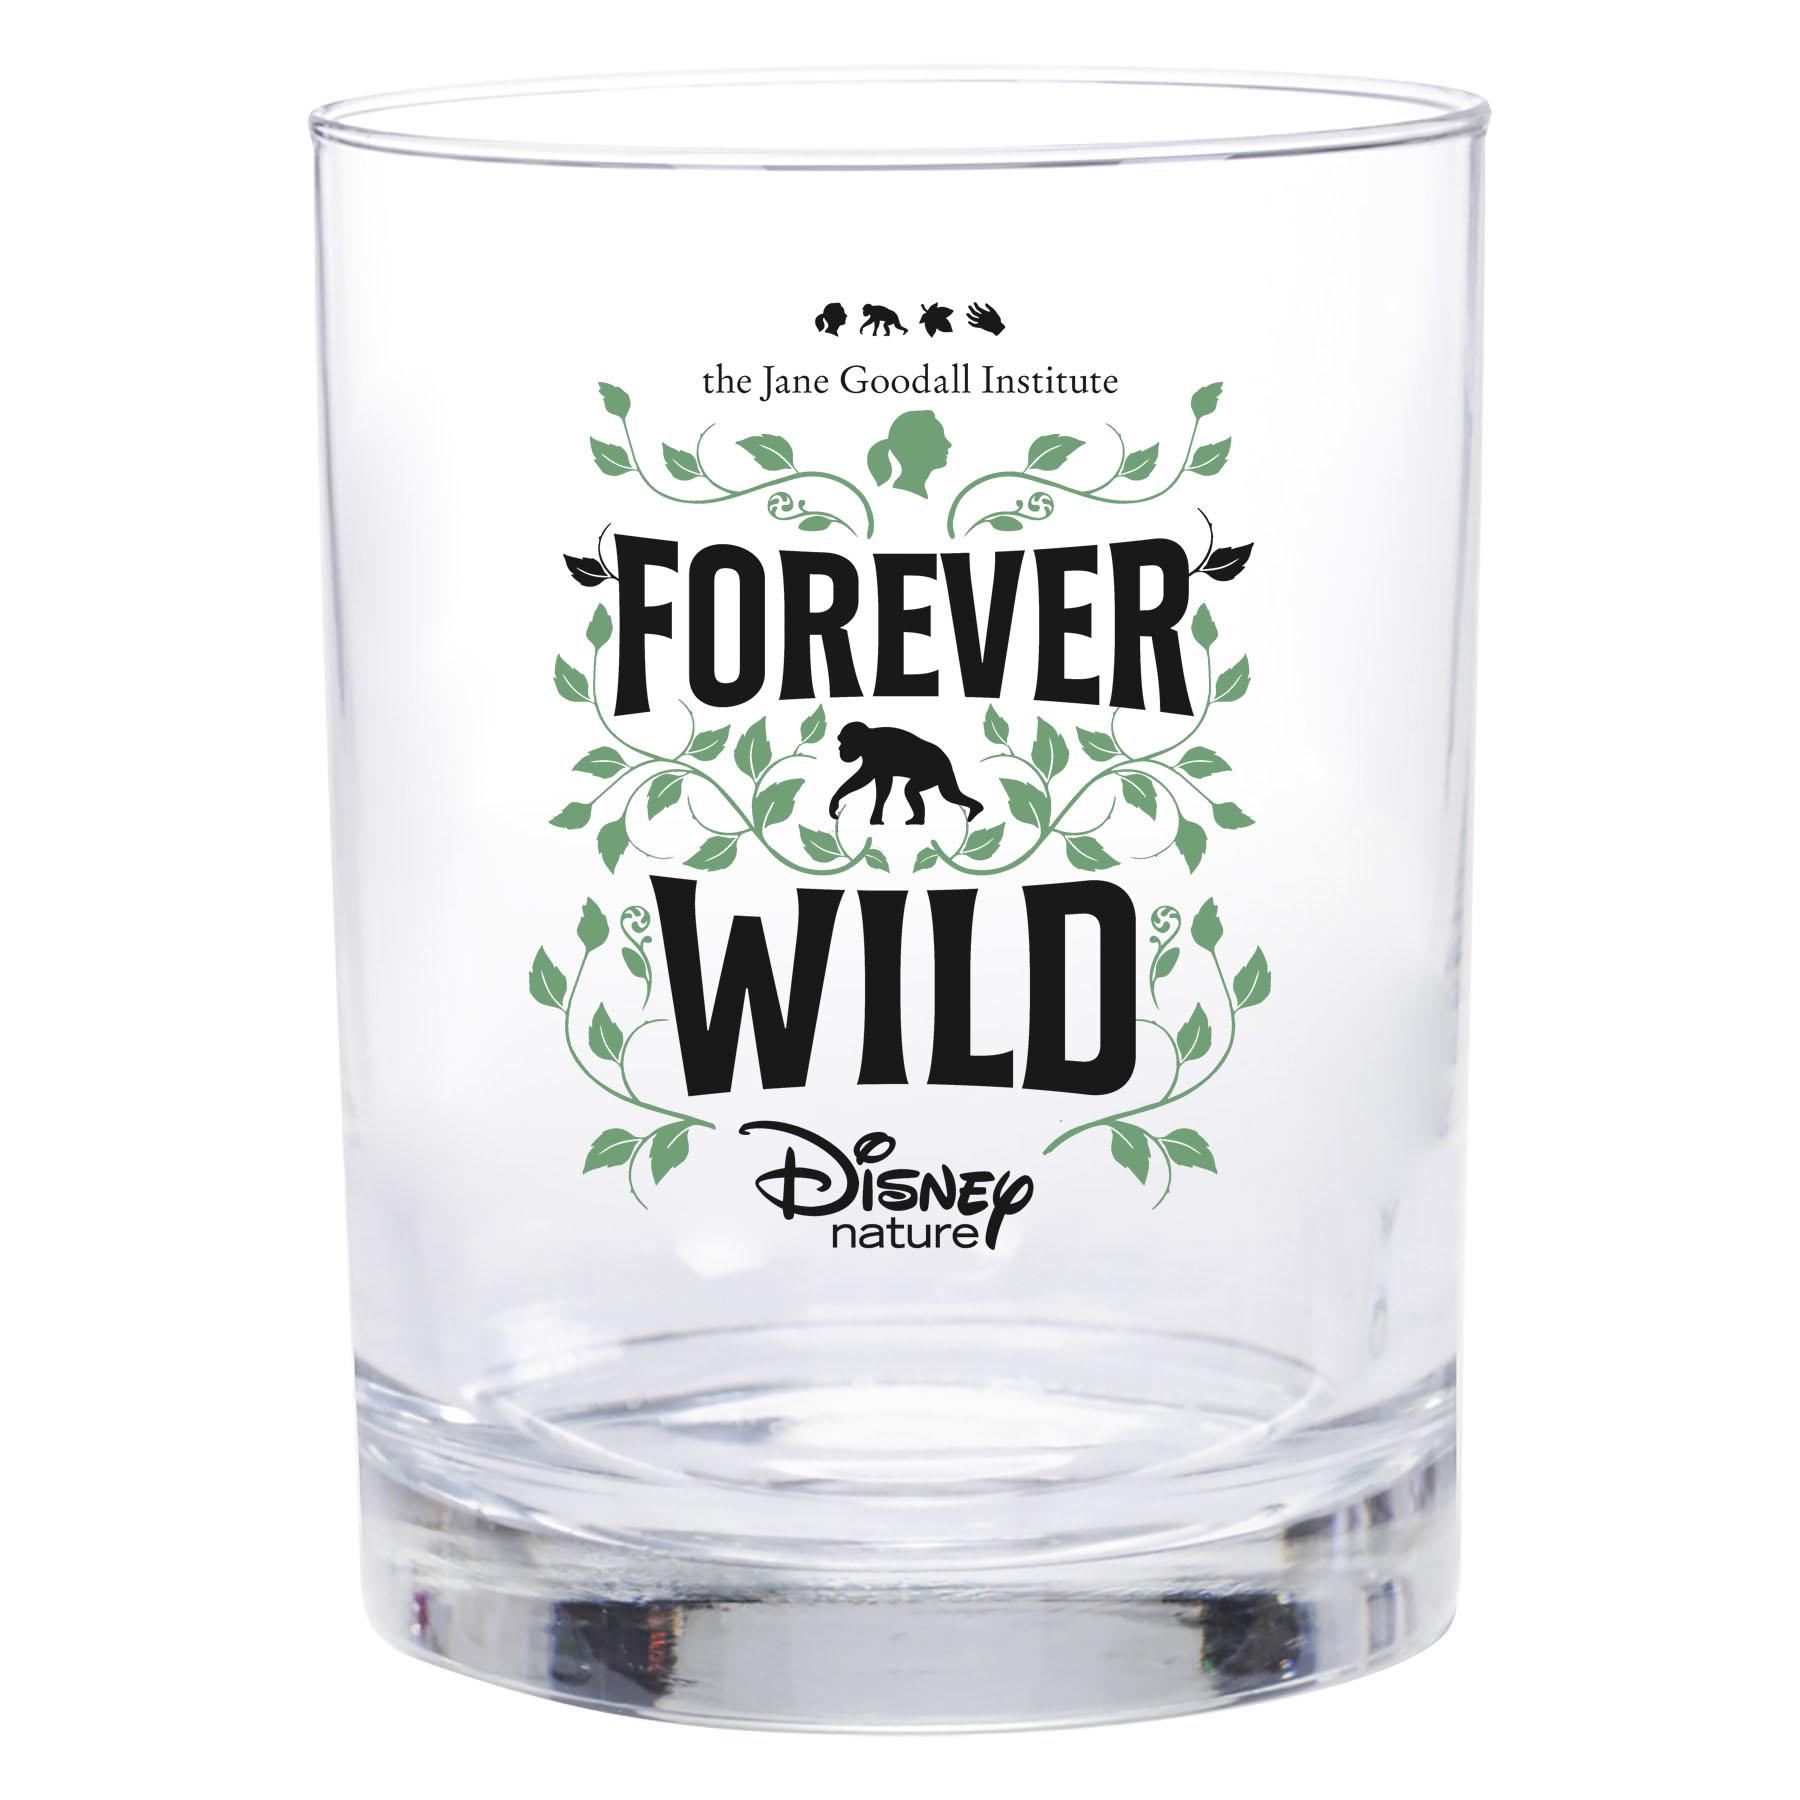 Disneynature + JGI Forever Wild - 13.5 oz Rocks Glass